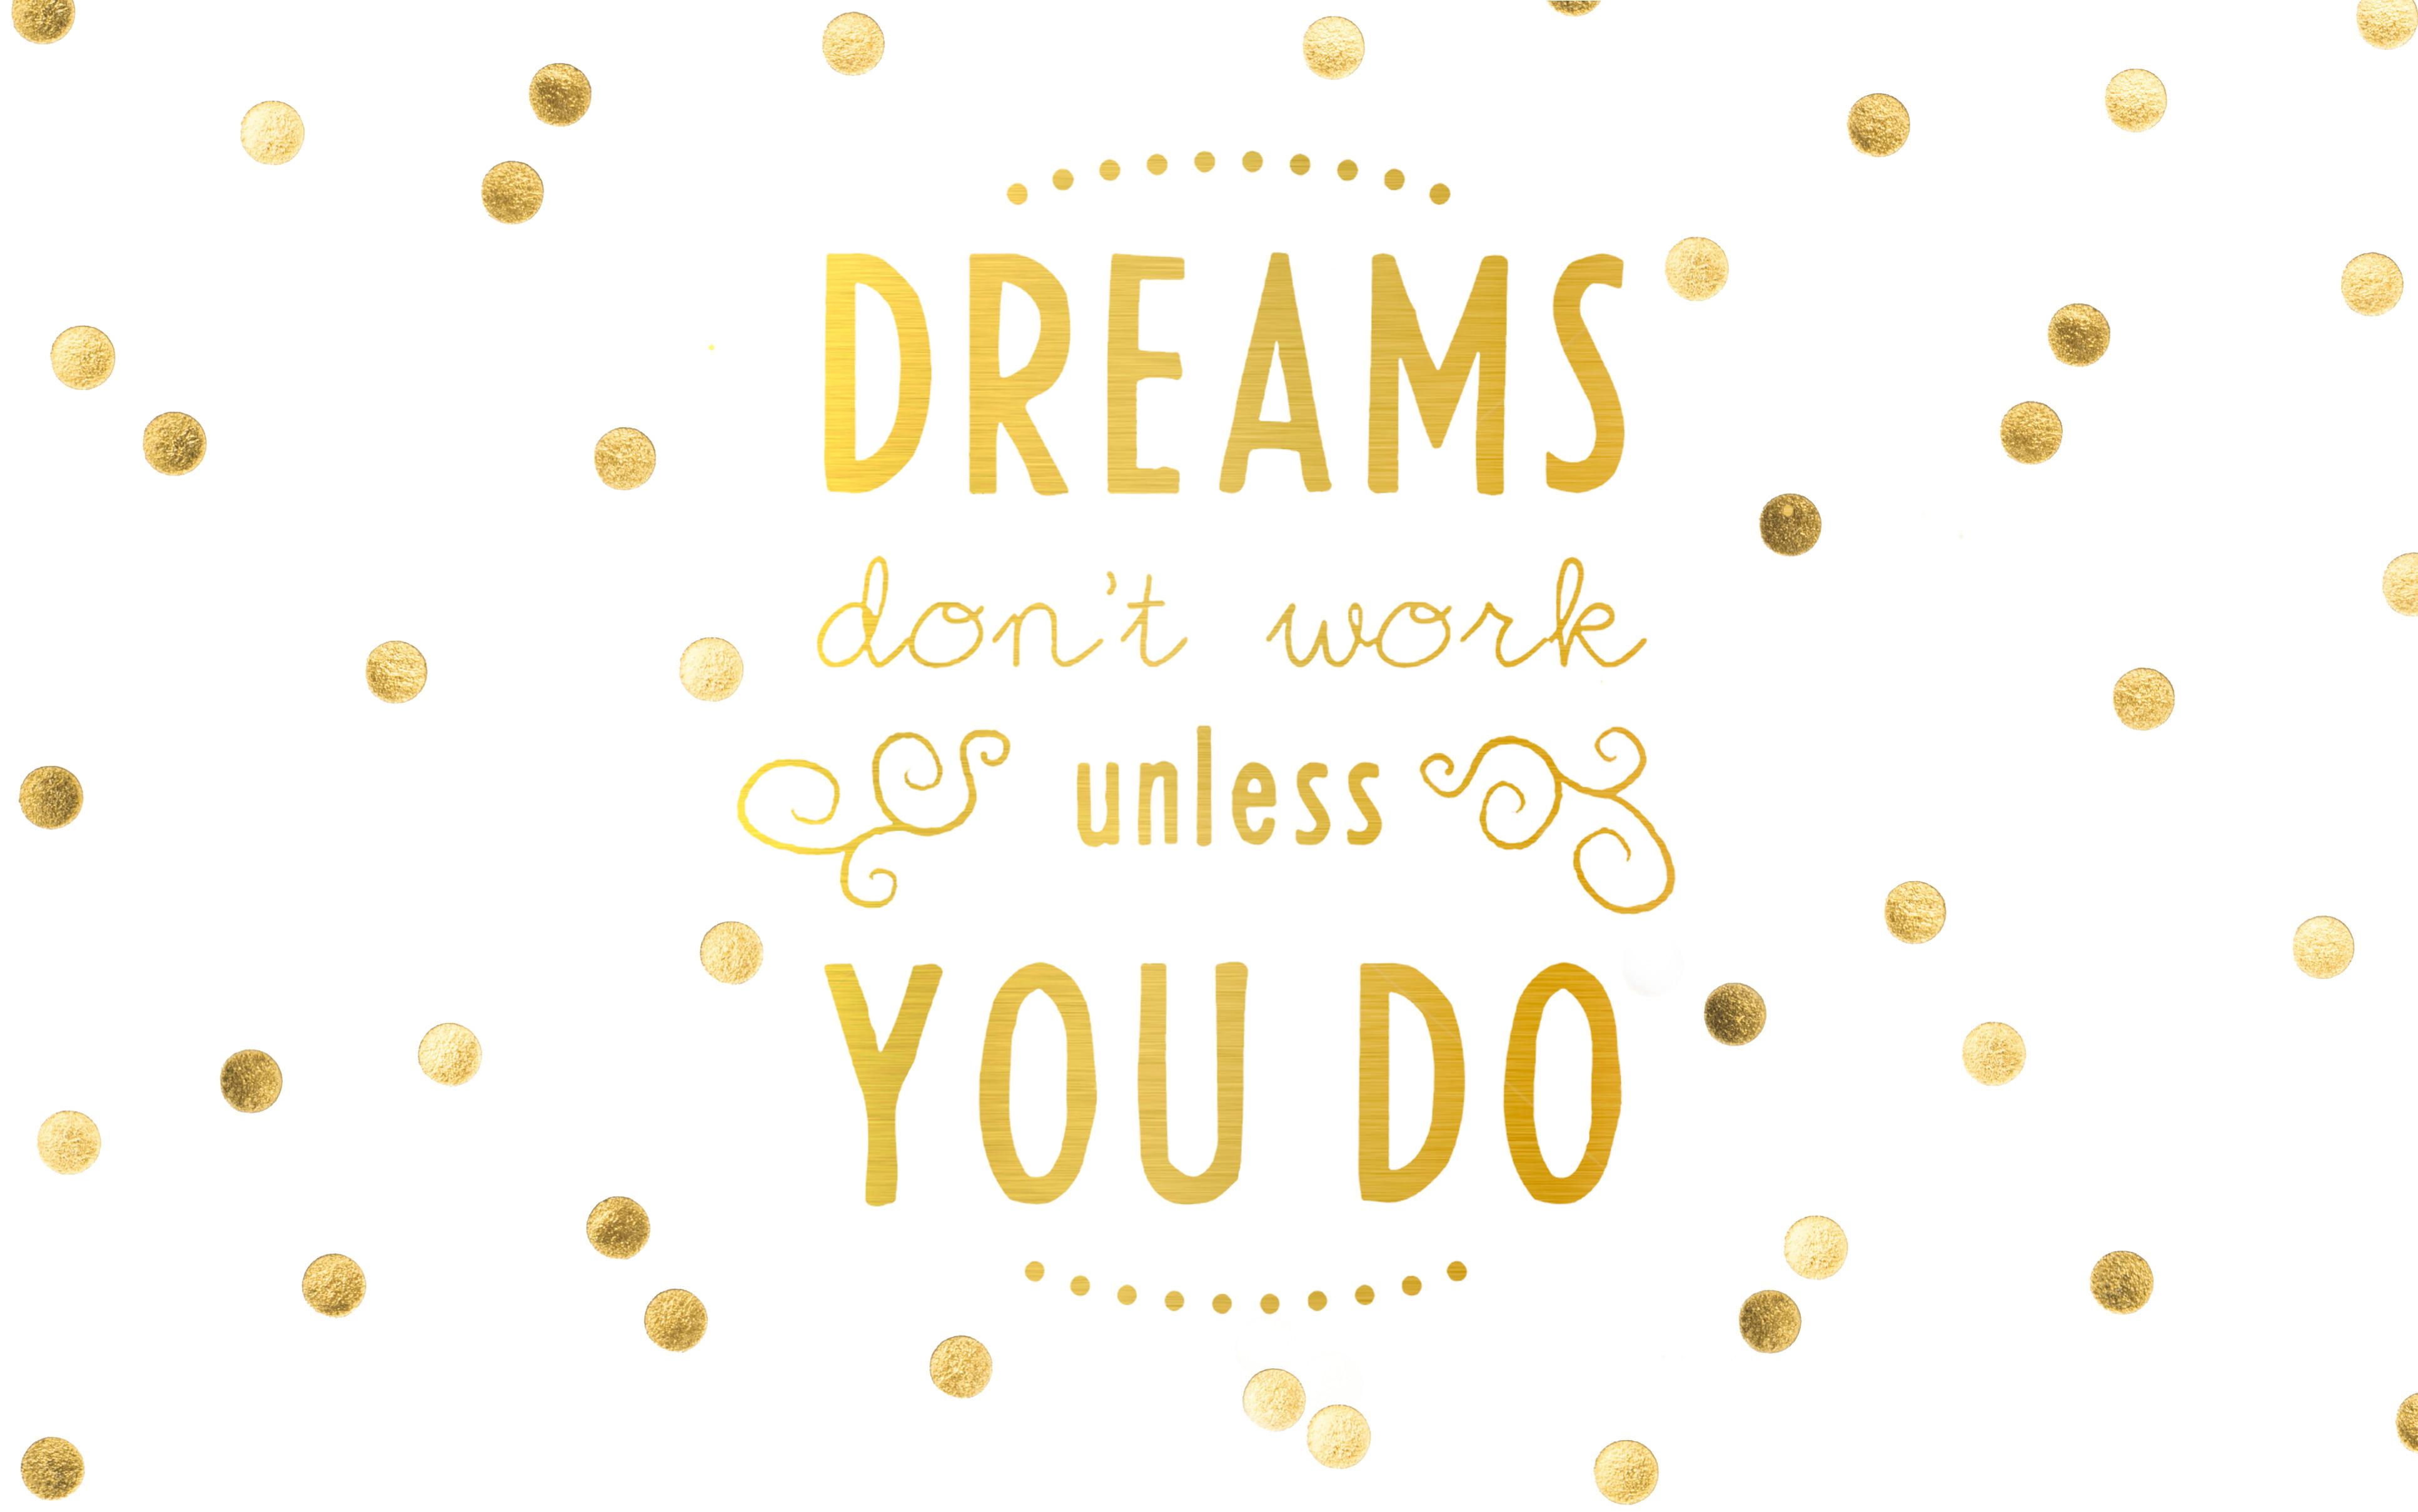 download DREAMS DONT WORK UNLESS YOU DO 3867 X 2418 DESKTOP 3867x2418